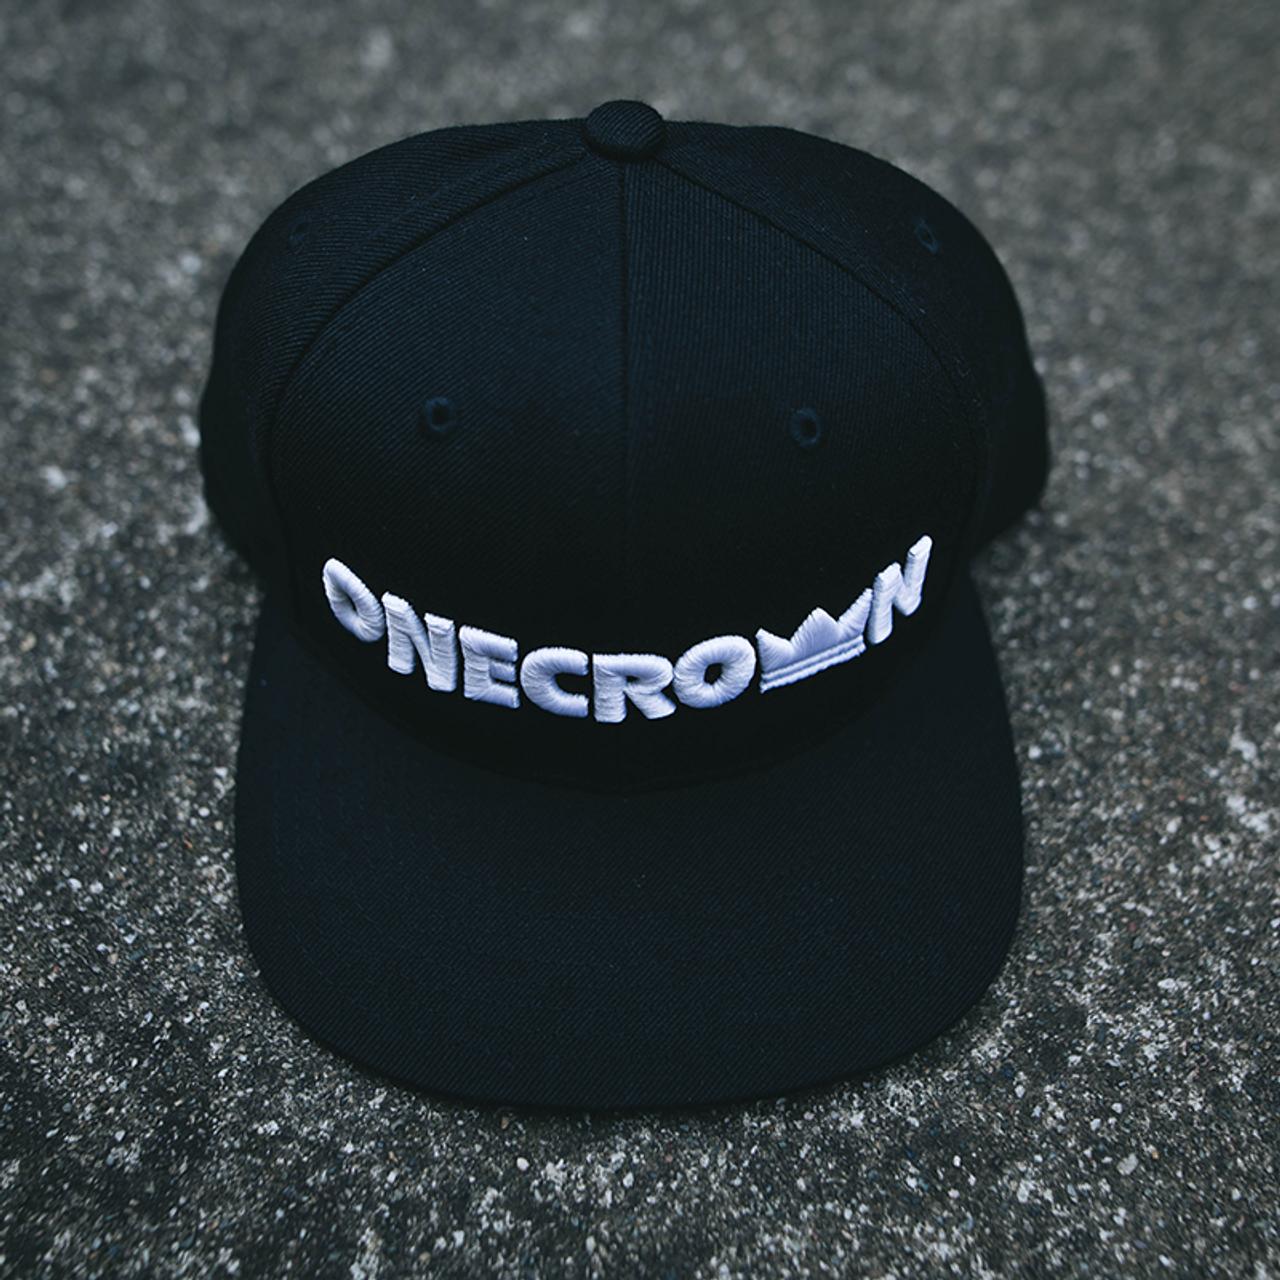 Onecrown Logo - Snapback Hat - Black